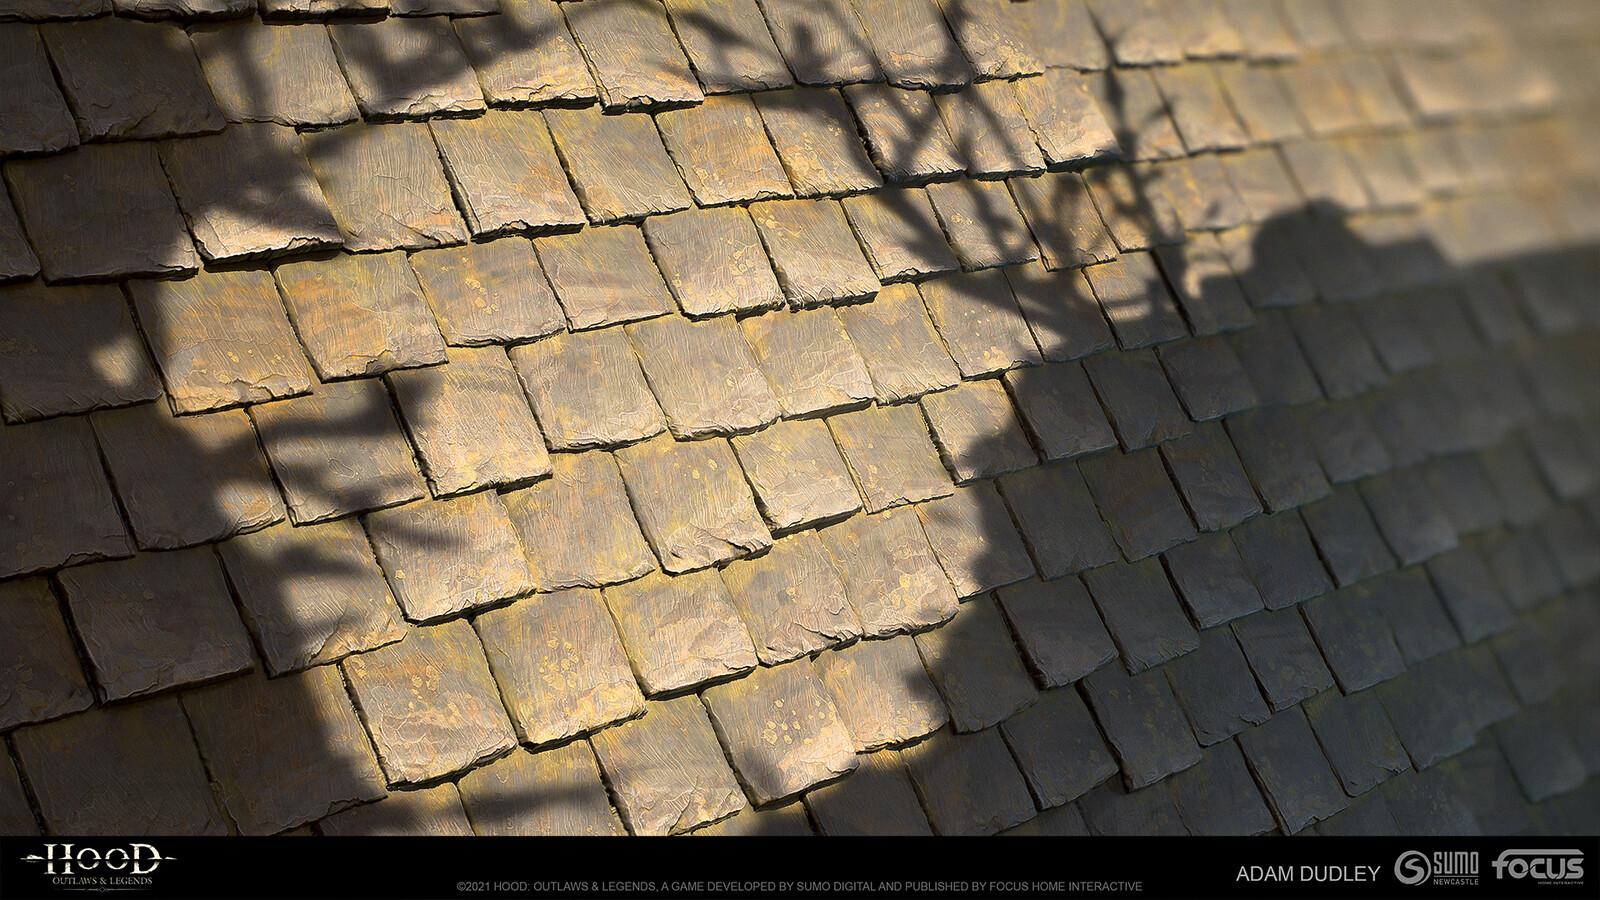 Roof slate tiles